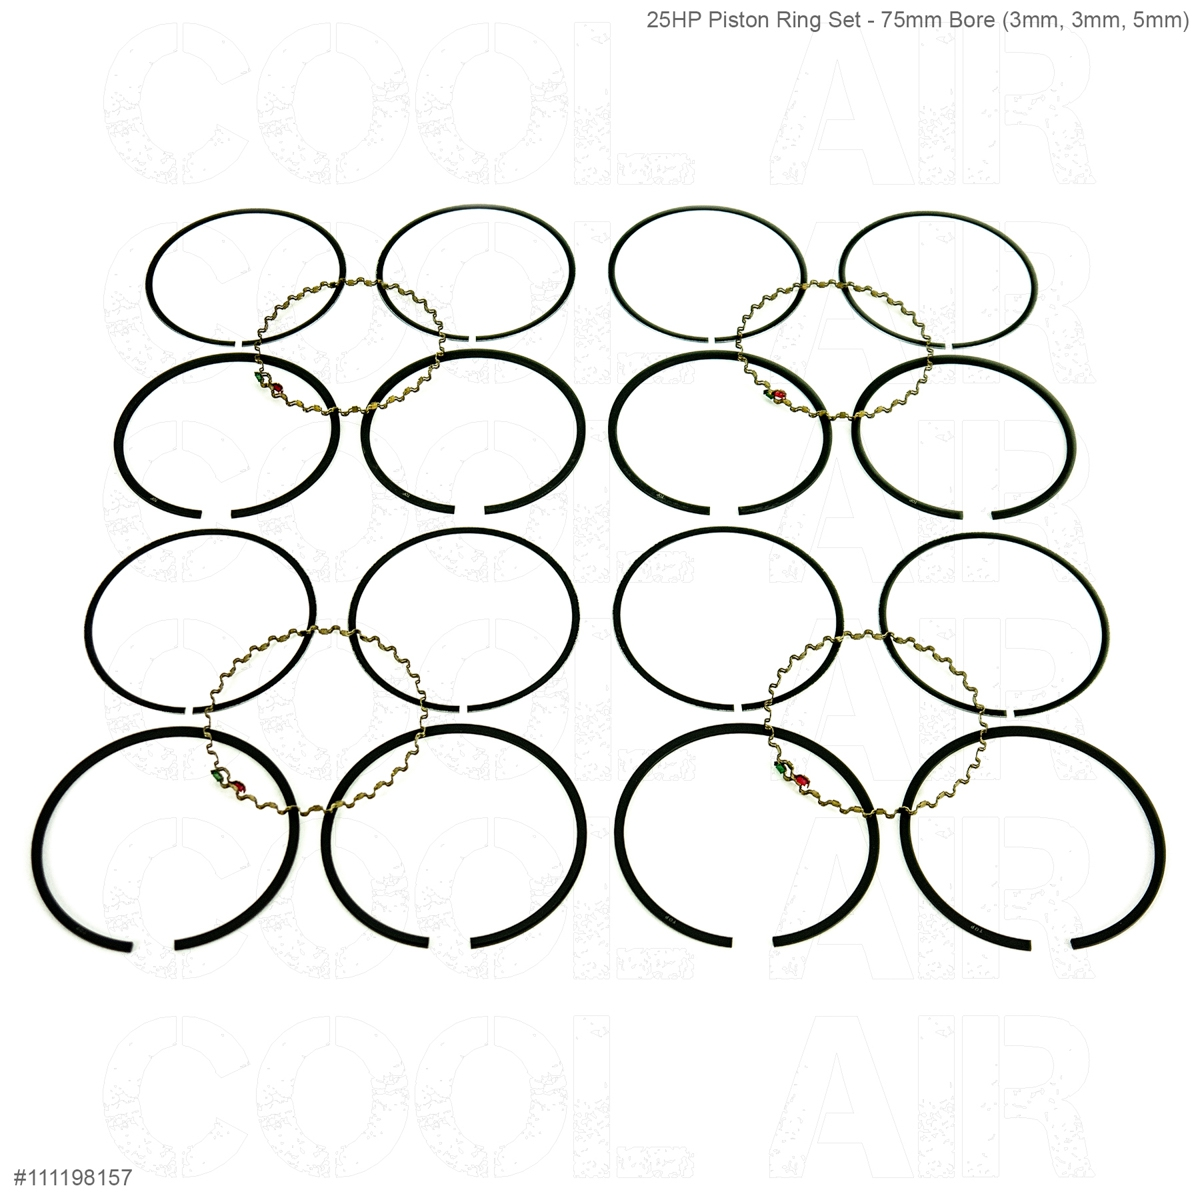 25HP Piston Ring Set - 75mm Bore (3mm, 3mm, 5mm)